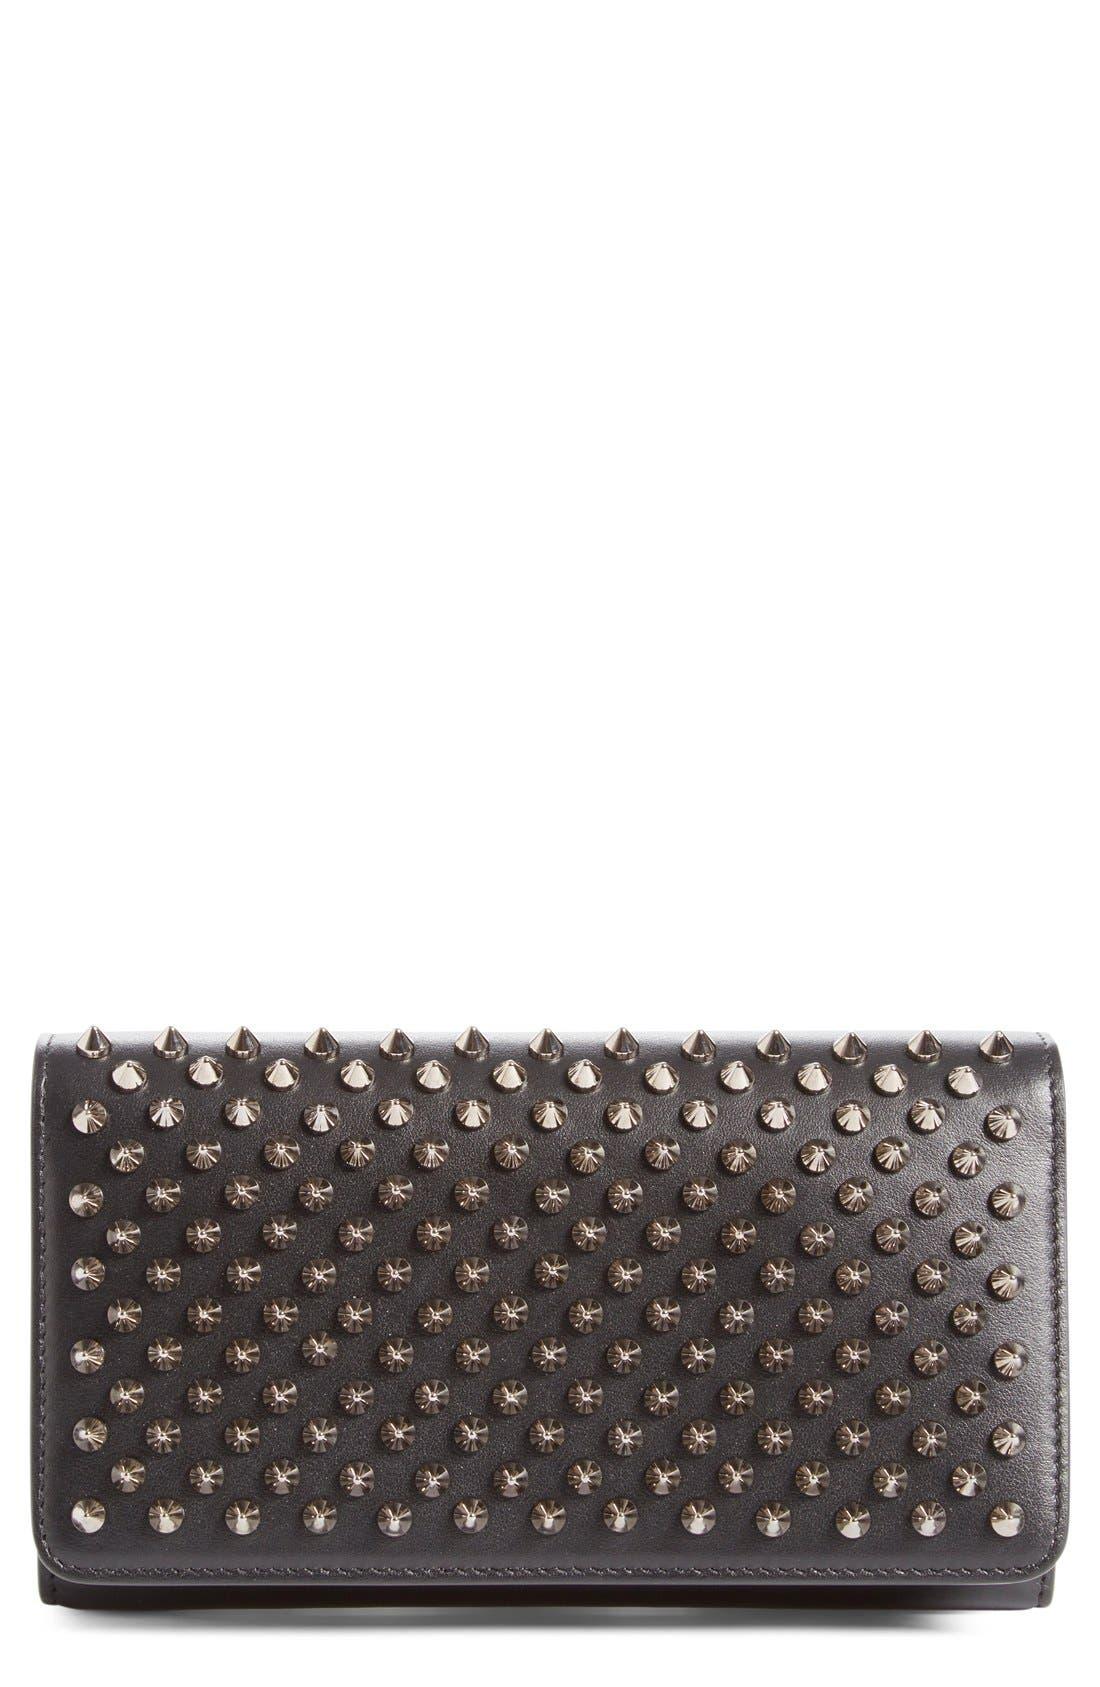 'Macaron' Studded Leather Continental Wallet,                             Main thumbnail 1, color,                             Black/ Gunmetal